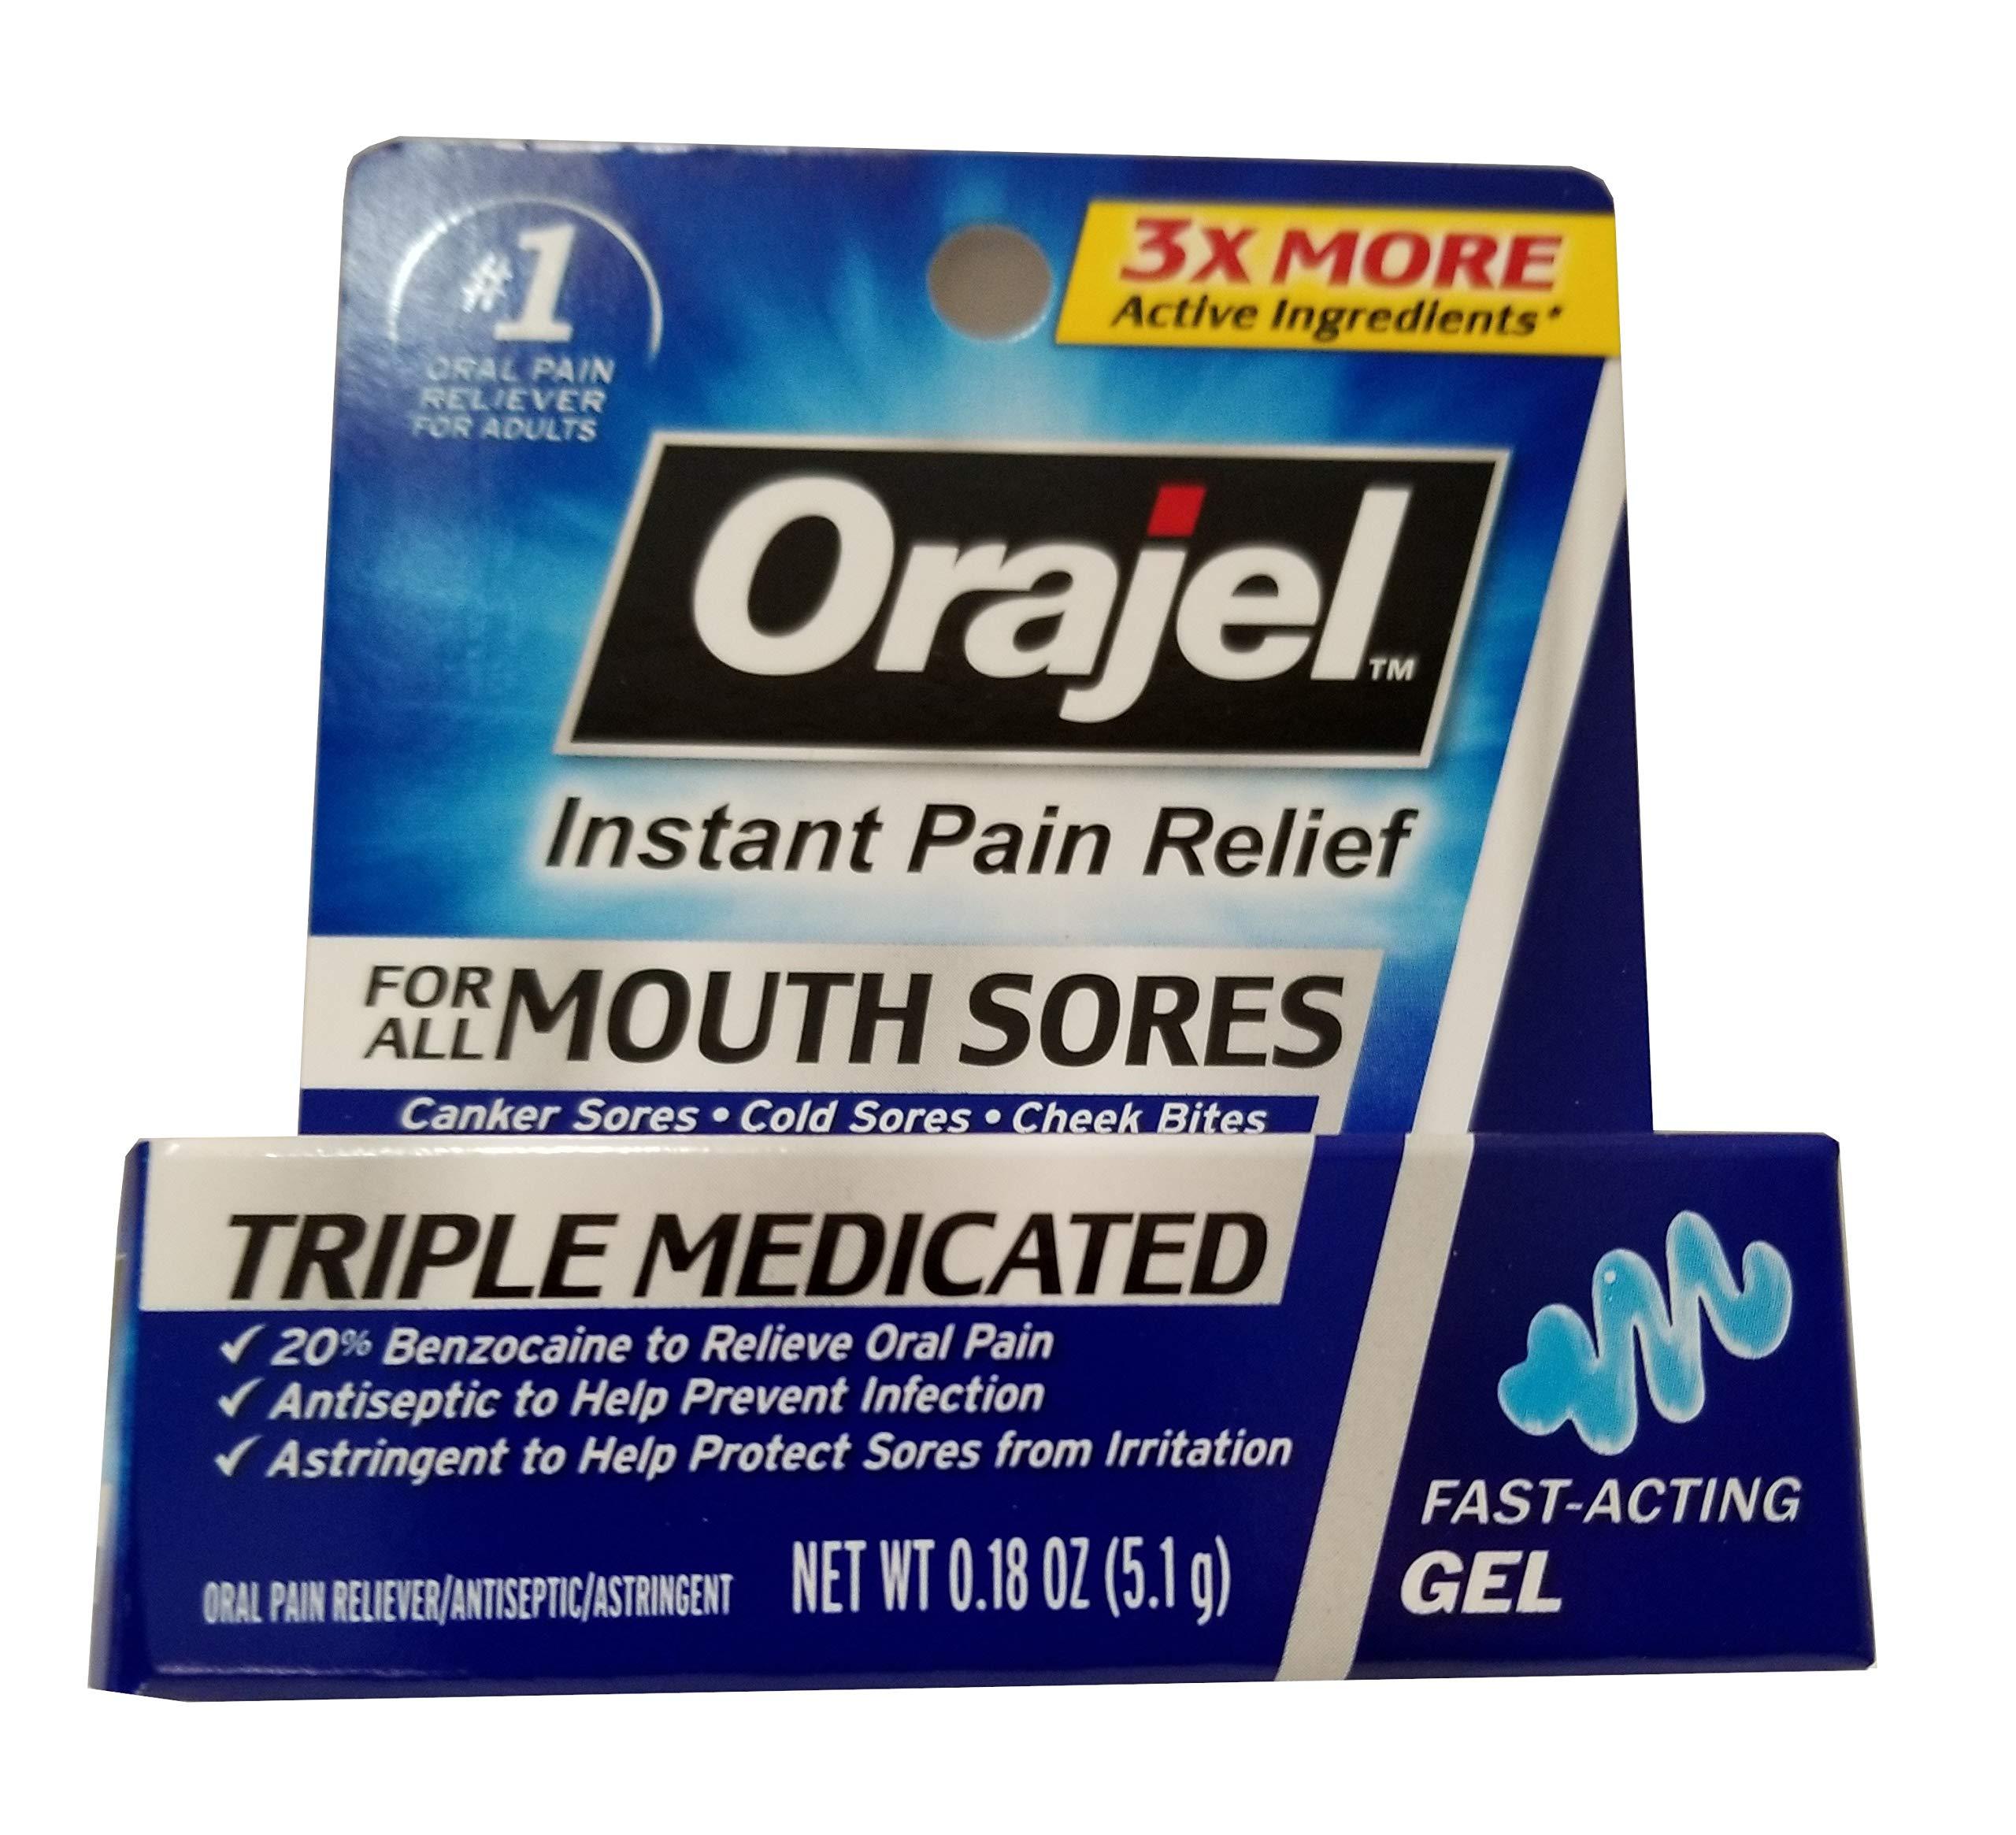 Orajel Mouth Sore Relief Gel, Maximum Strength - 0.18 oz, Pack of 5